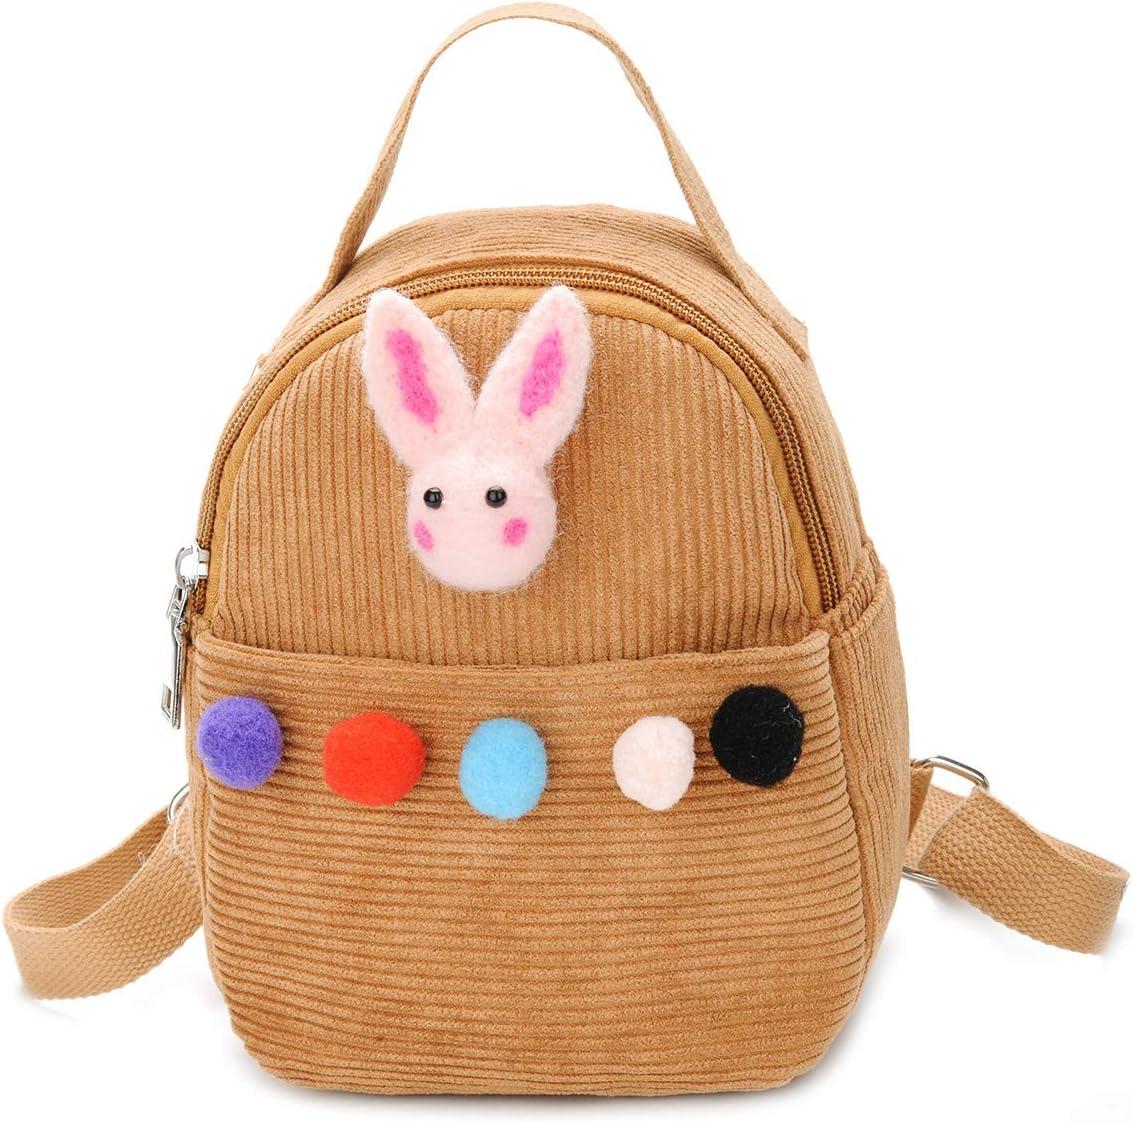 Baby Kid Children Backpack School Bag Kindergarten Toddler Cartoon Animal Boy Girl Cute Shoulder Bag Light Brown